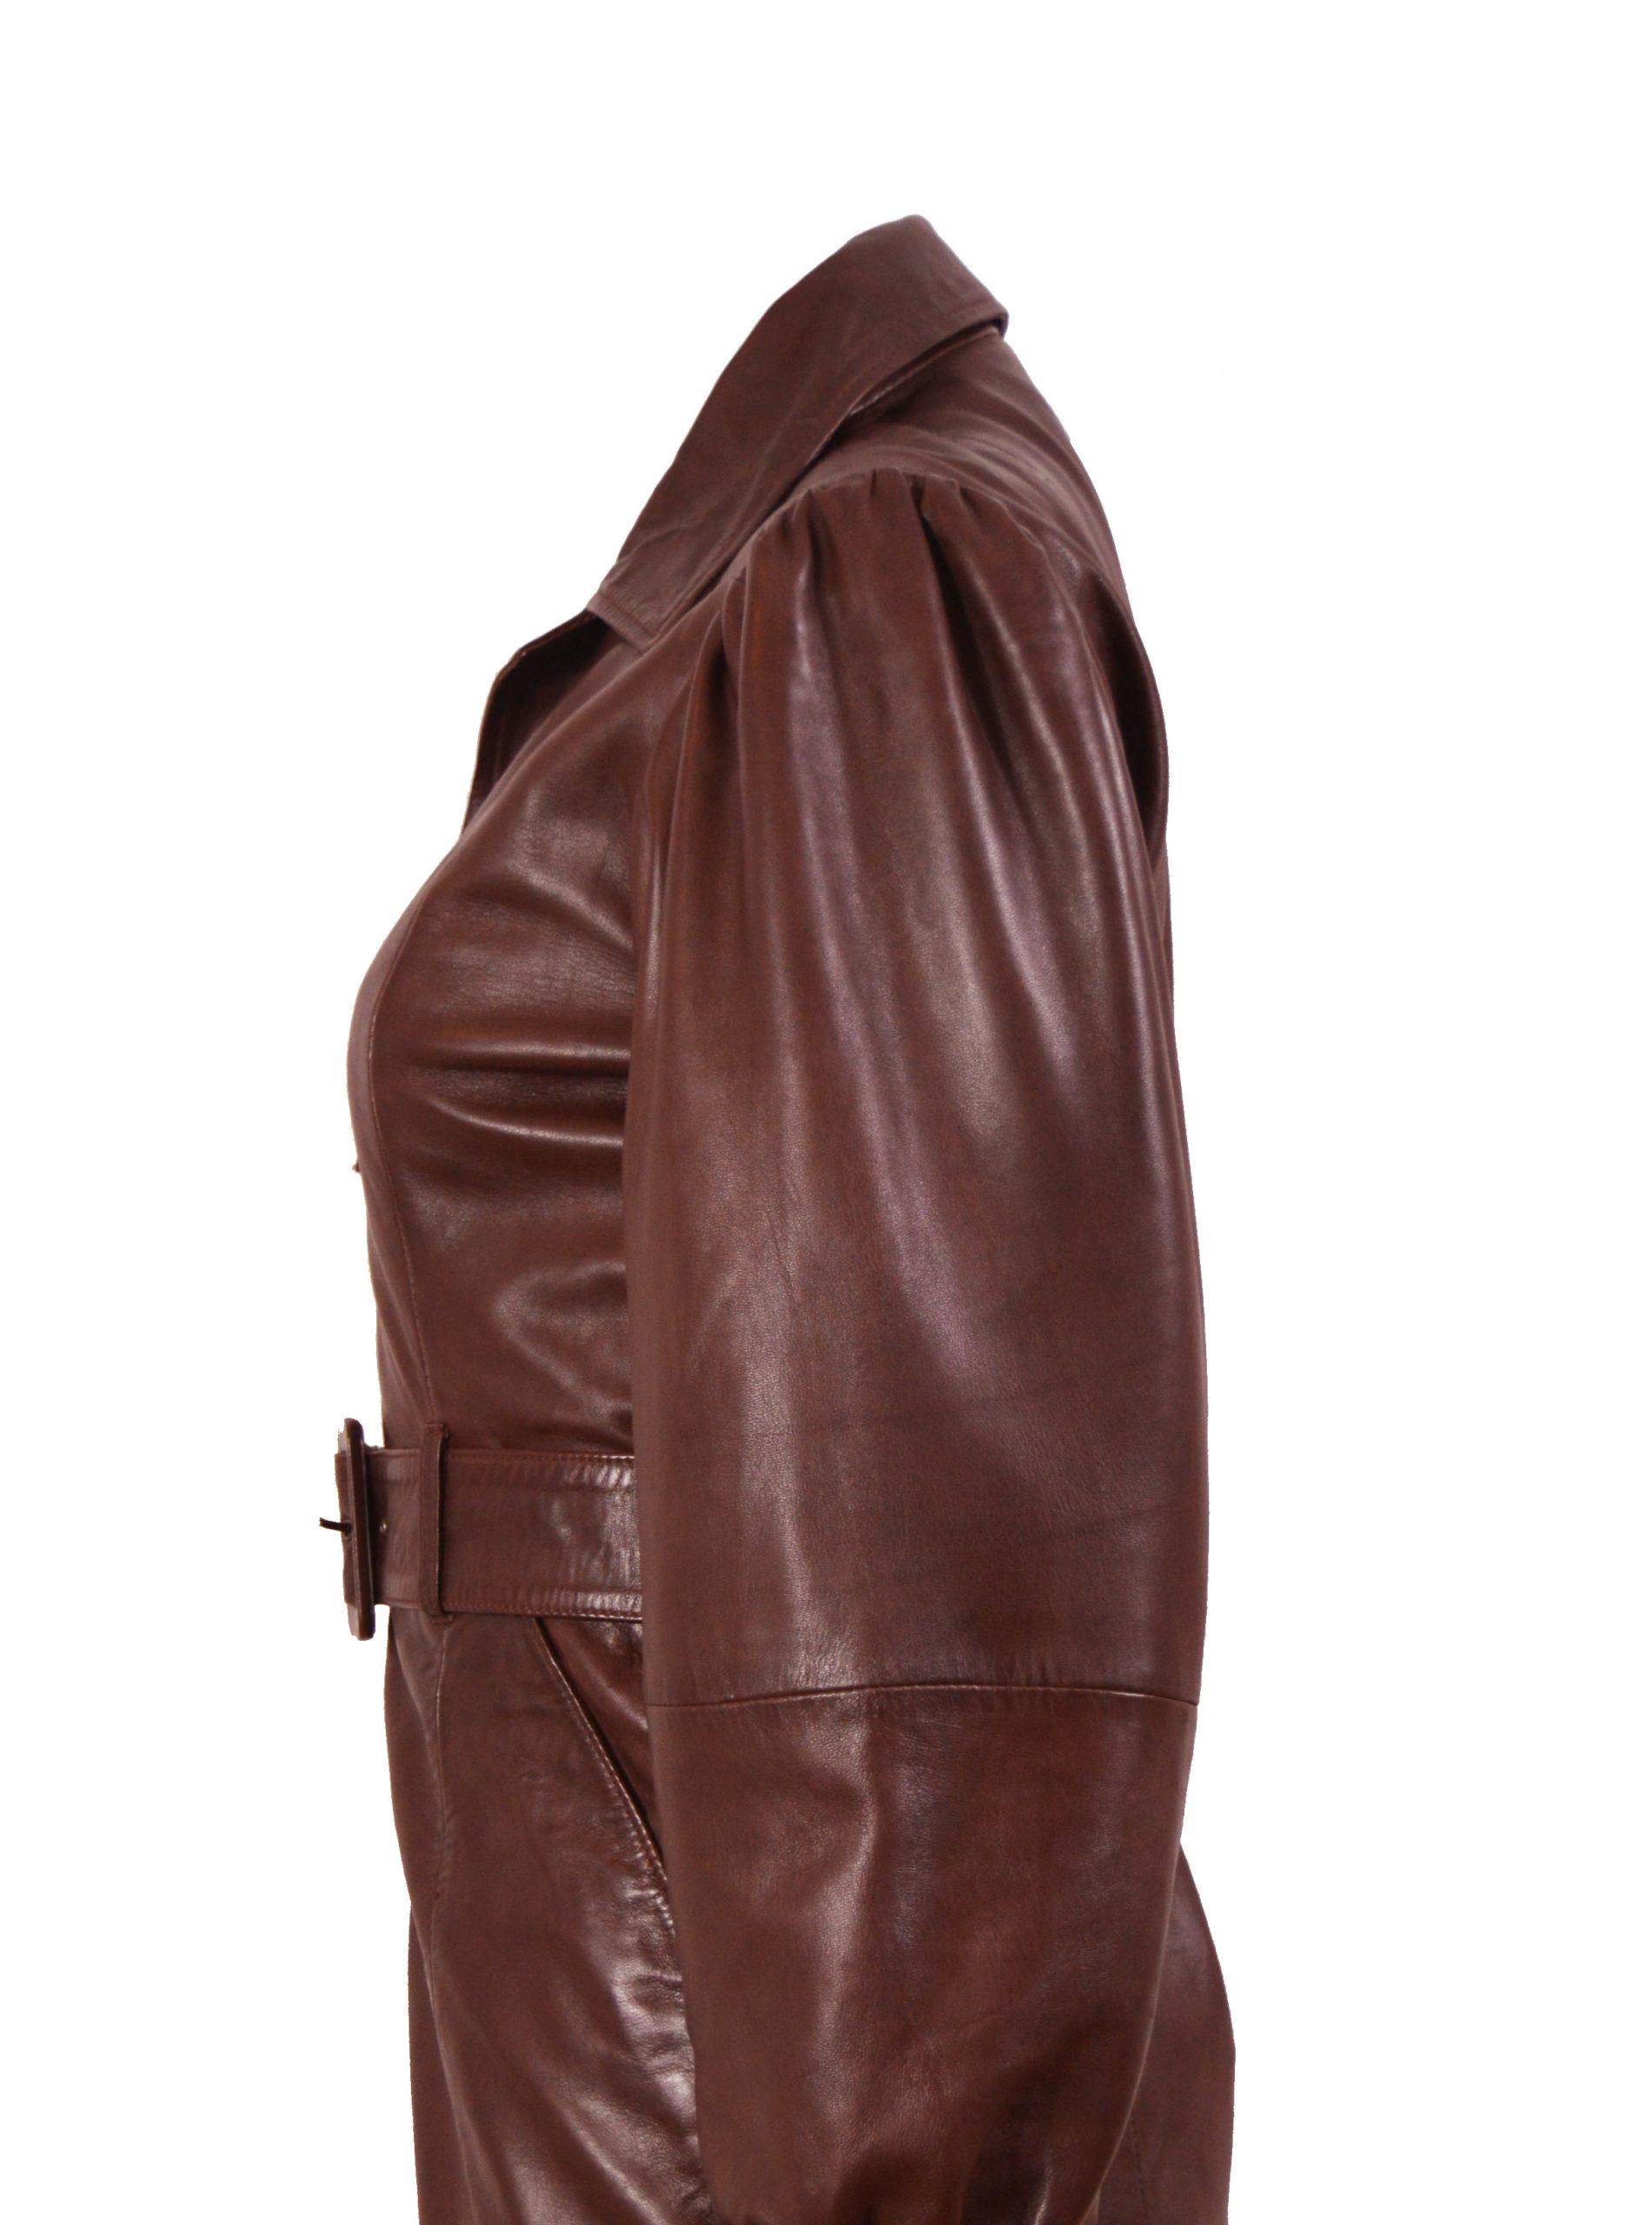 Zoef Leather Jurk Monica Aubergine 3